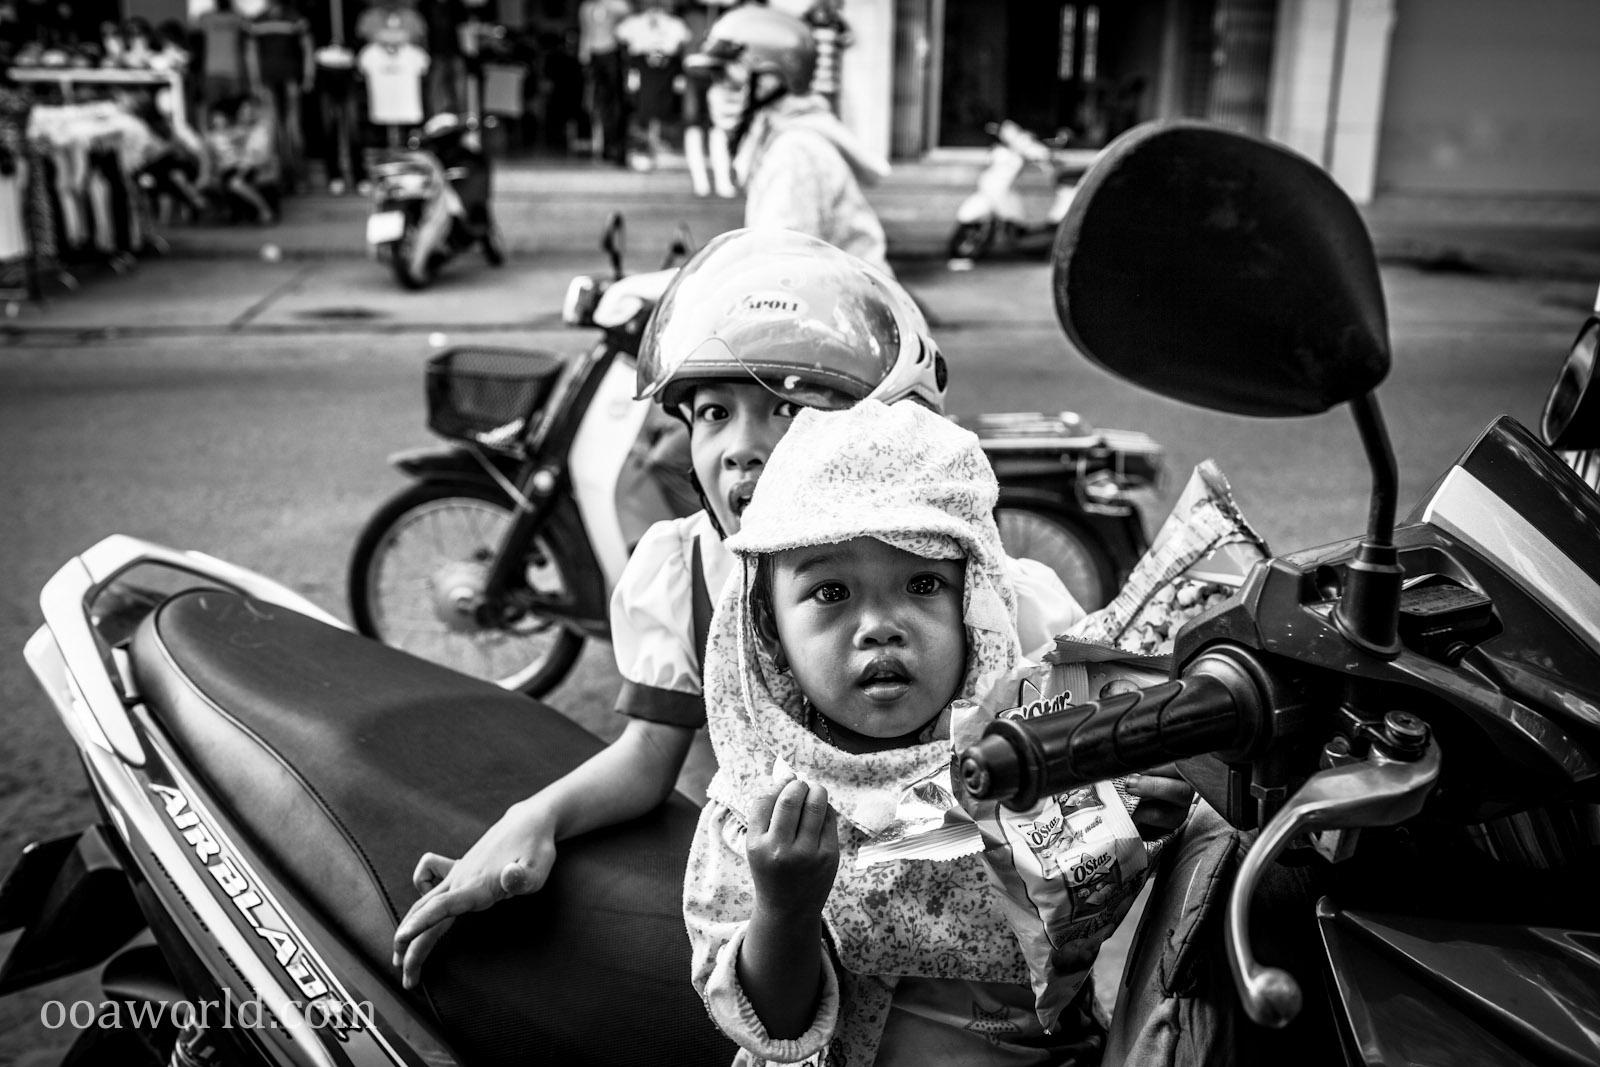 Kid Riders Hue Vietnam Photos Ooaworld